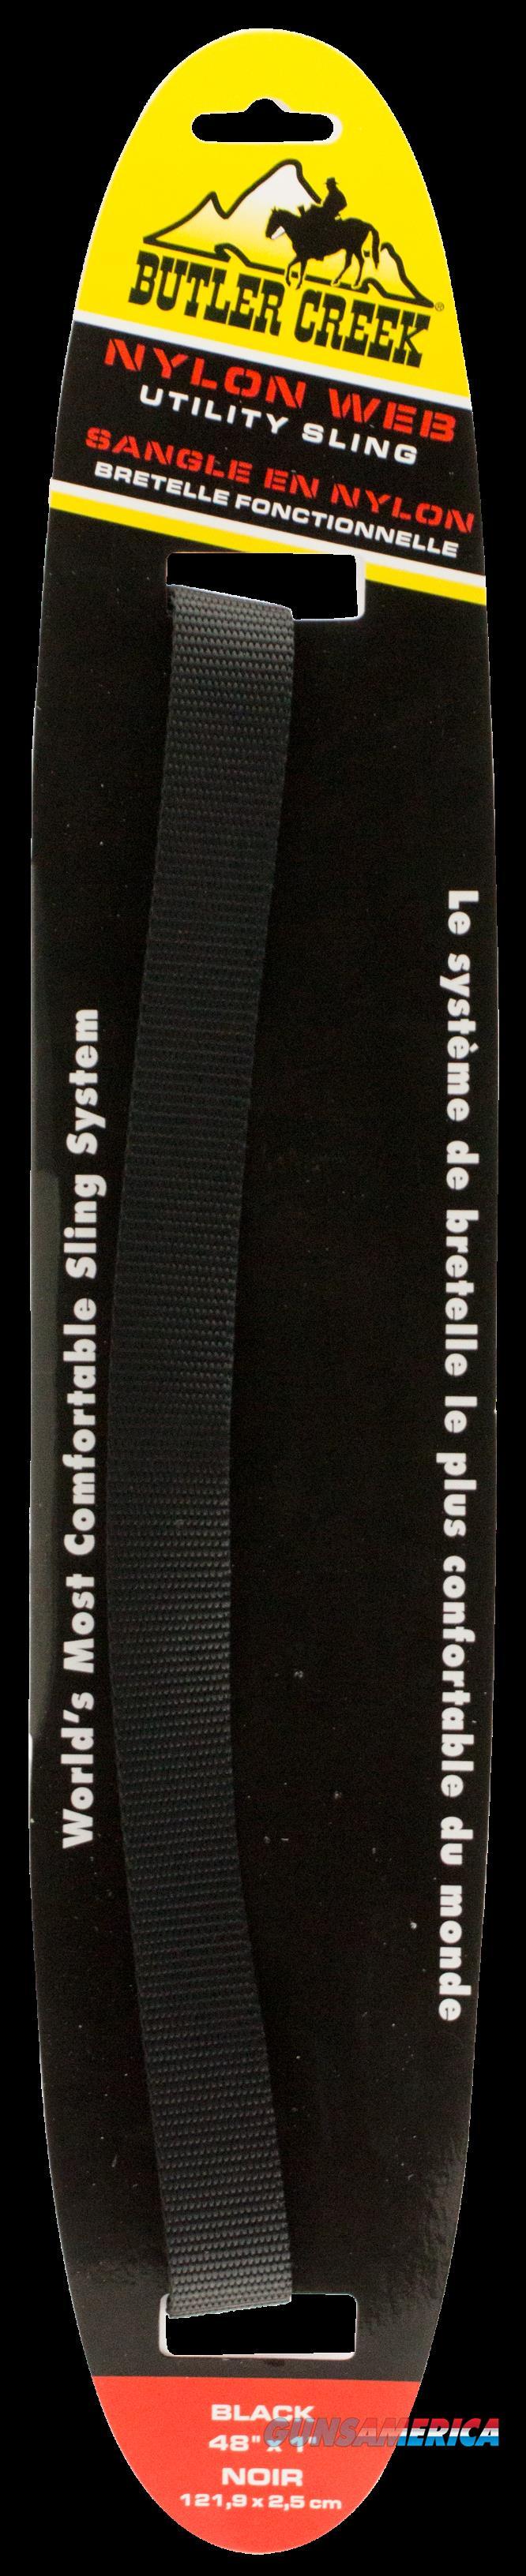 Butler Creek Utility, Btlr 26702 Sling Utility 48x1      Blk  Guns > Pistols > 1911 Pistol Copies (non-Colt)